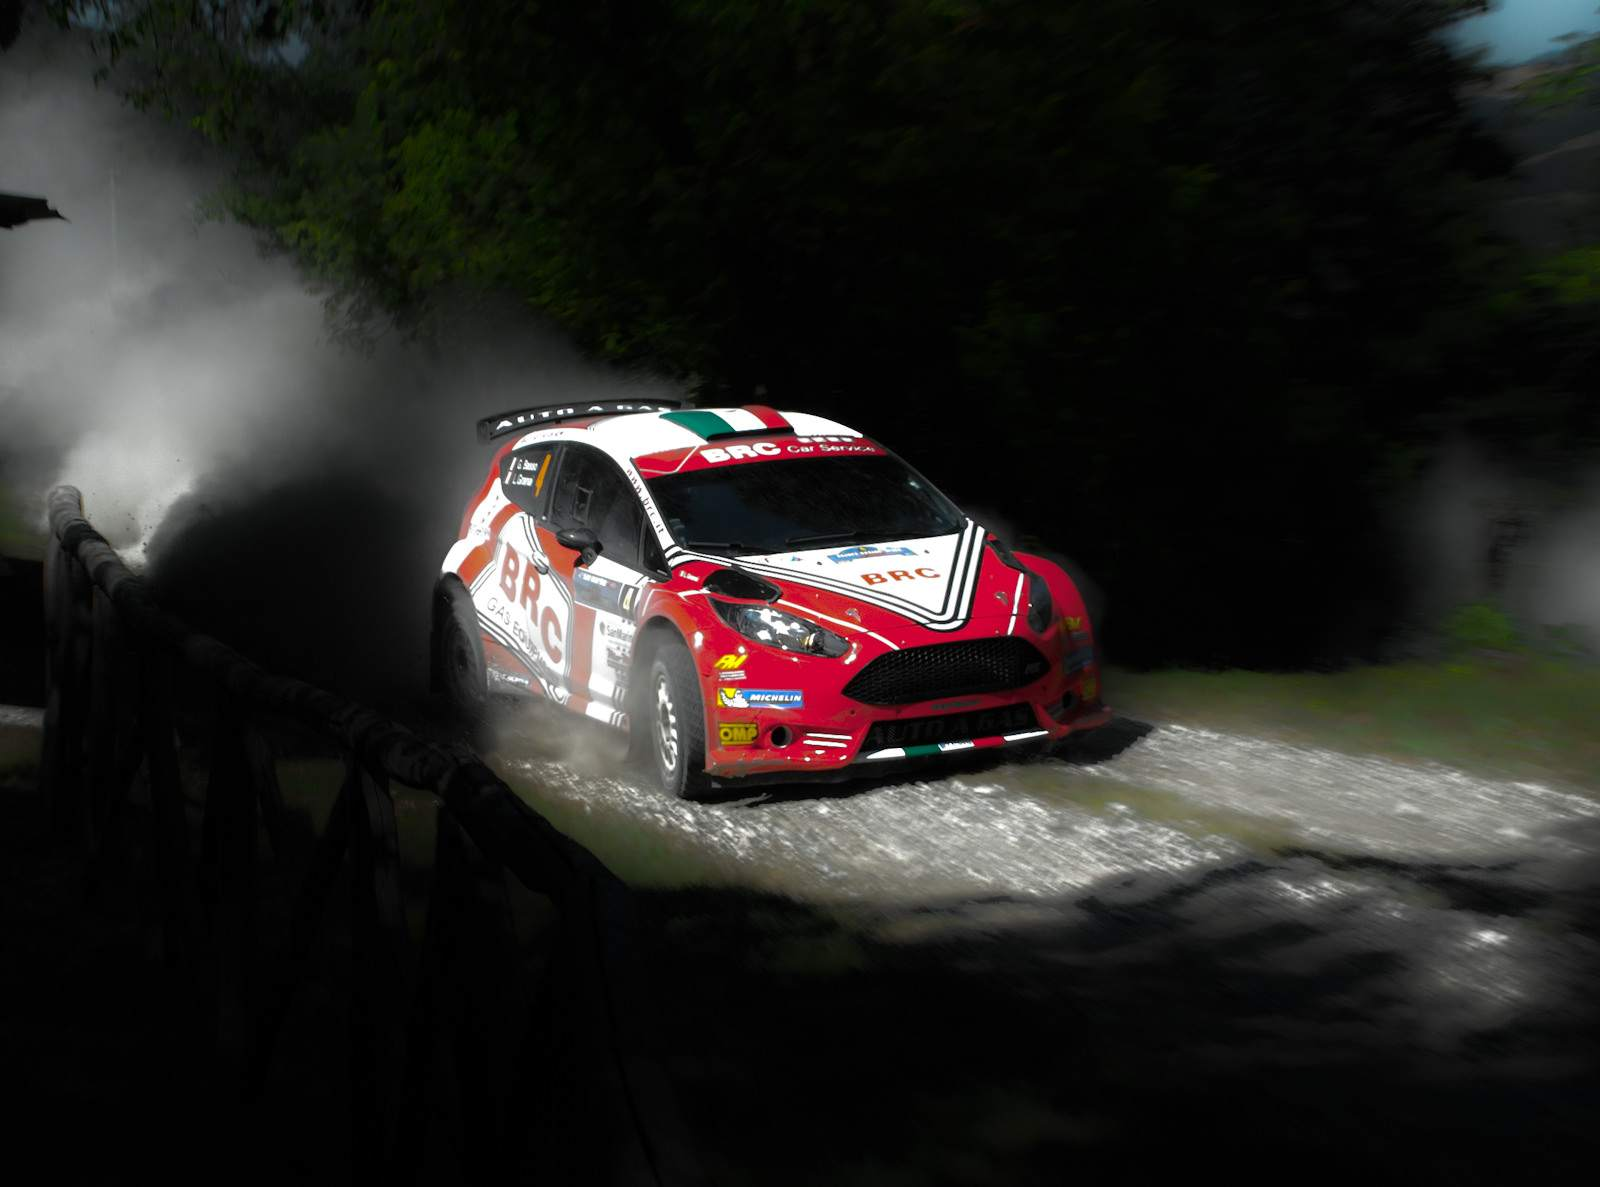 rally san marino 43th Rally San Marino 2015 Photos